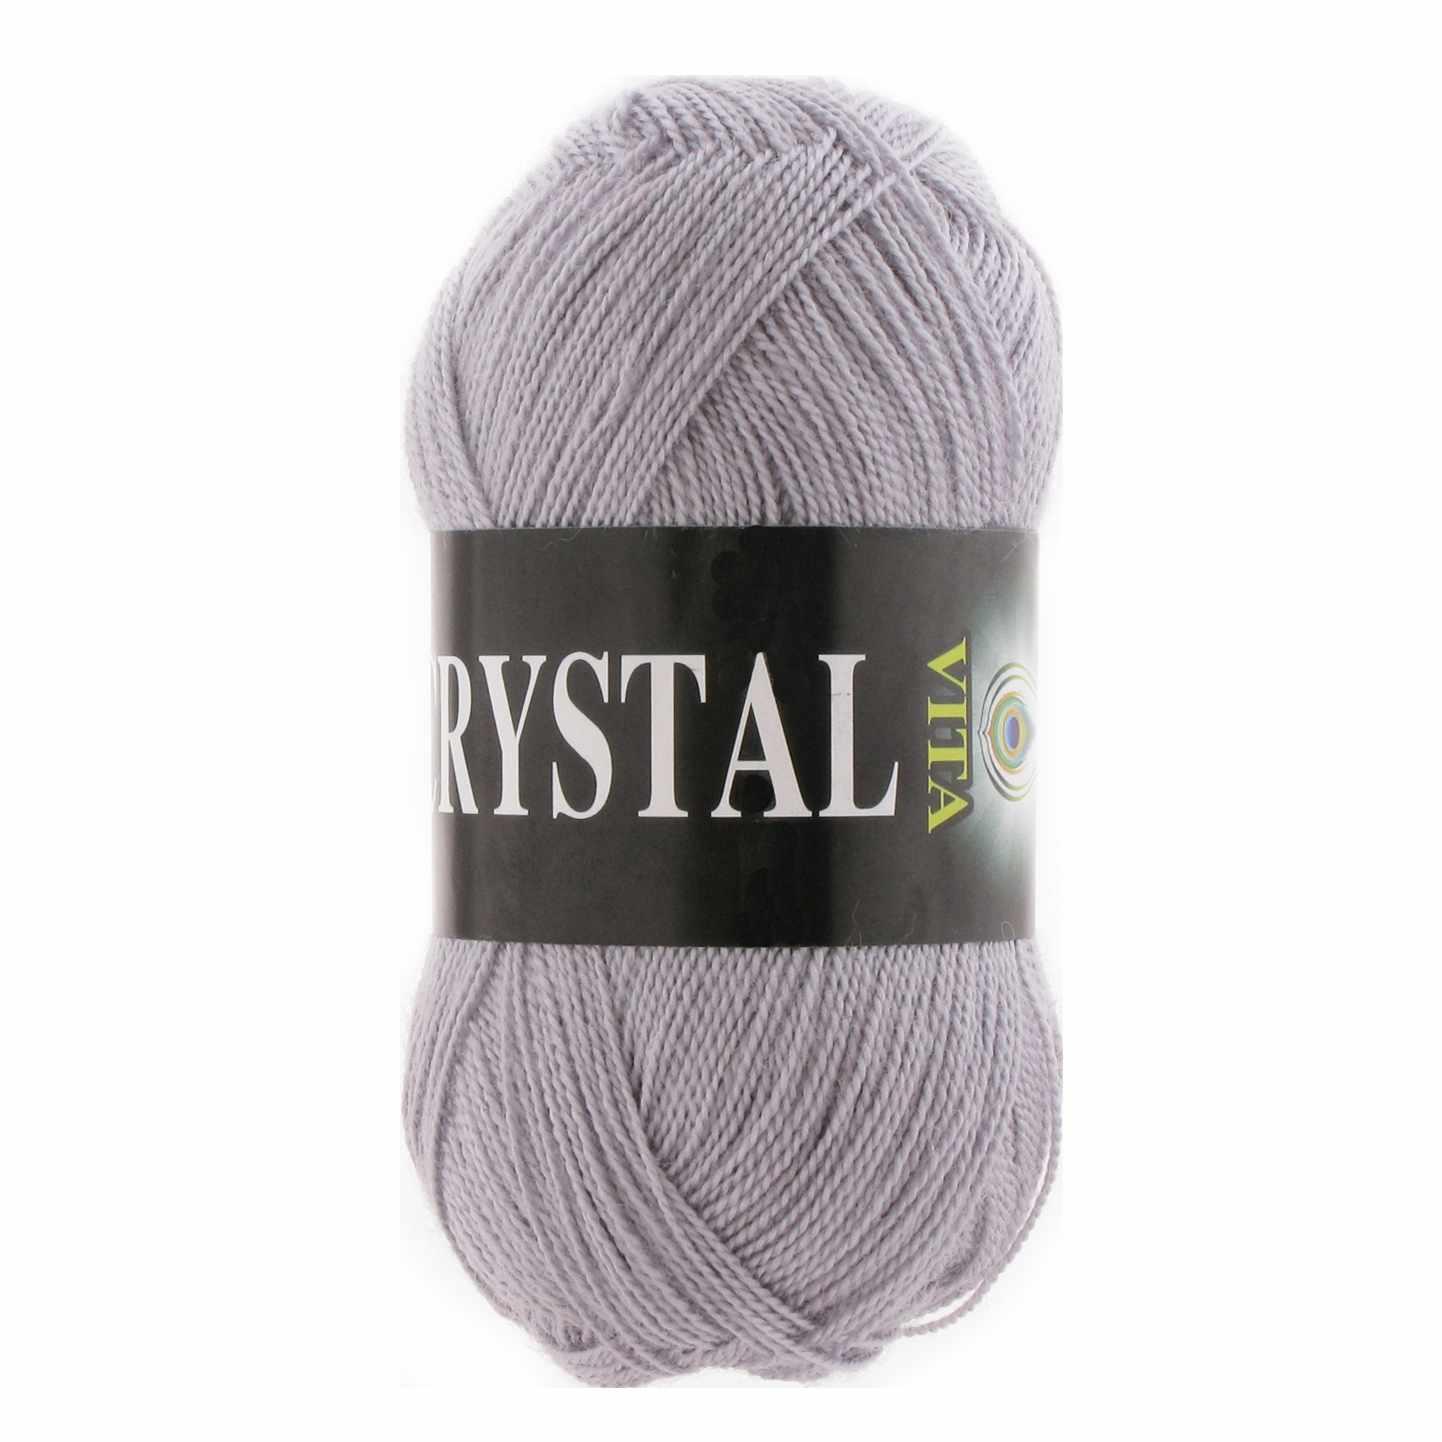 Пряжа VITA Crystal Цвет.5662 Серебро